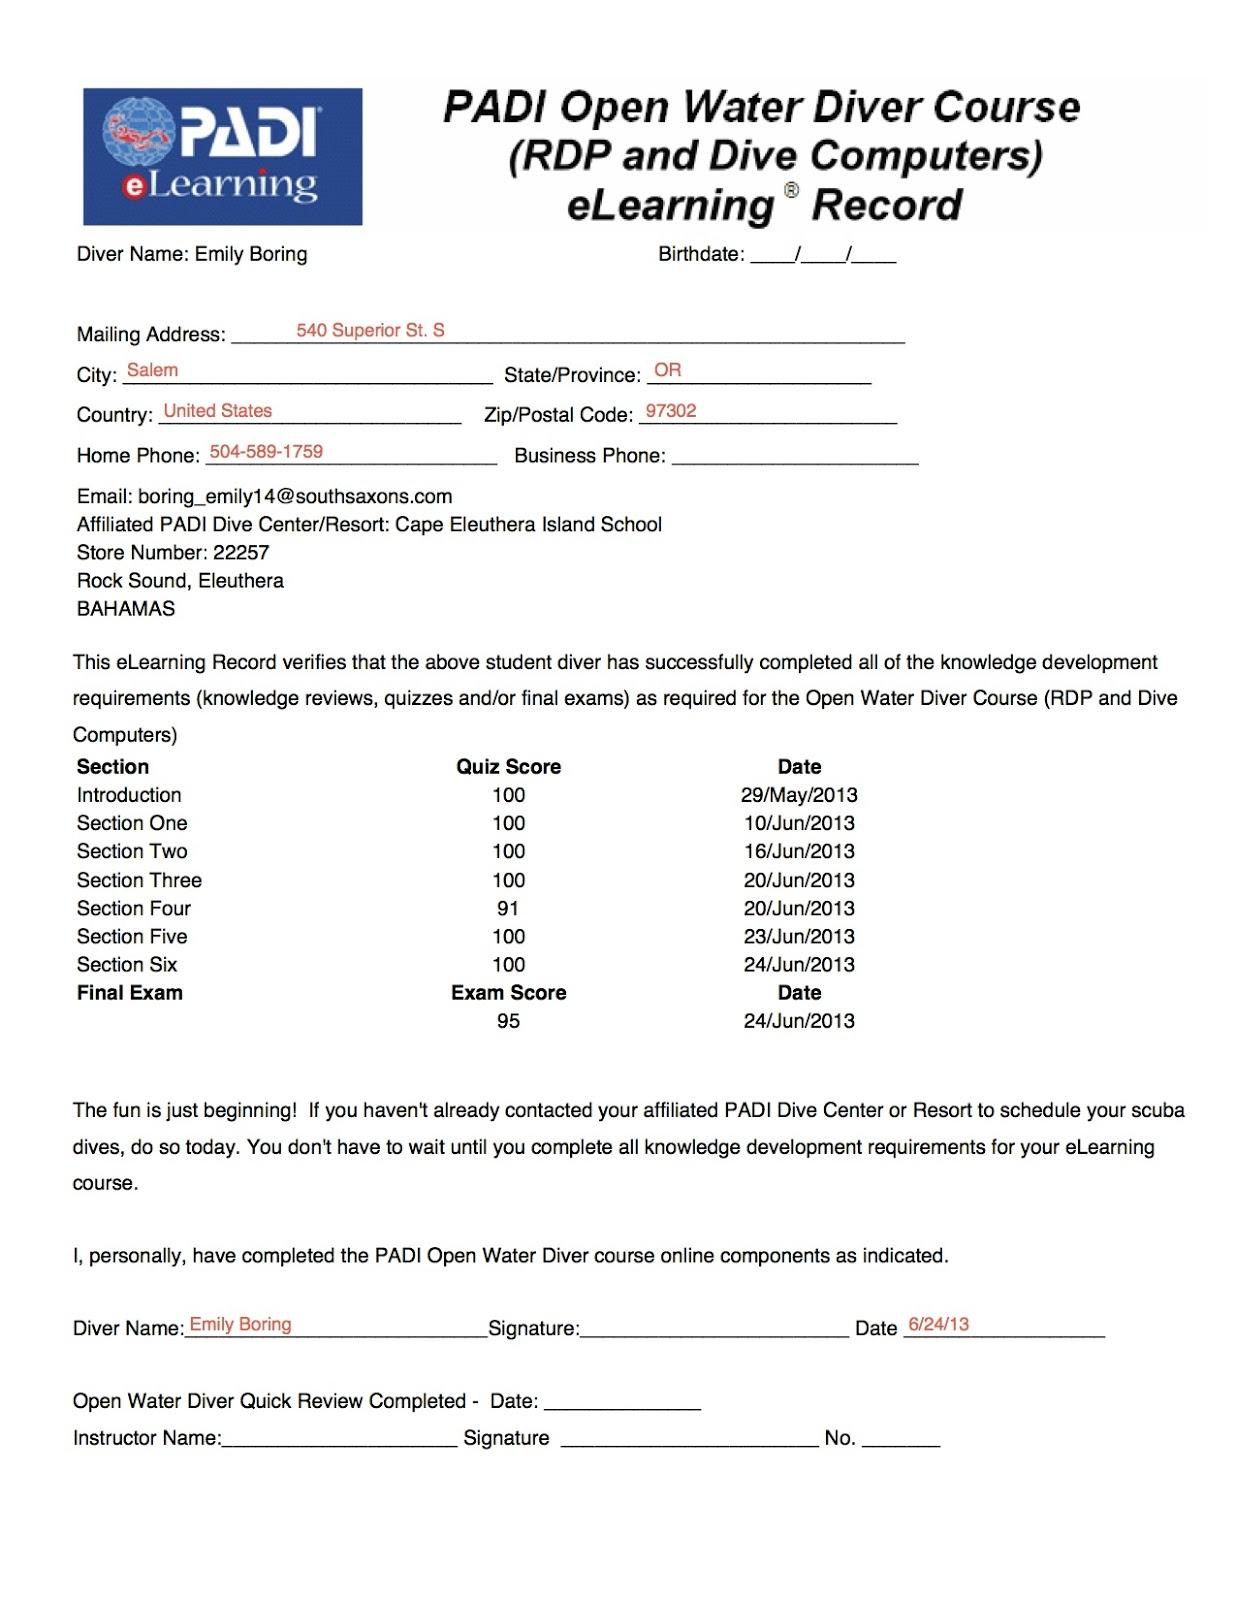 The Island School Online Scuba Certification Course Complete